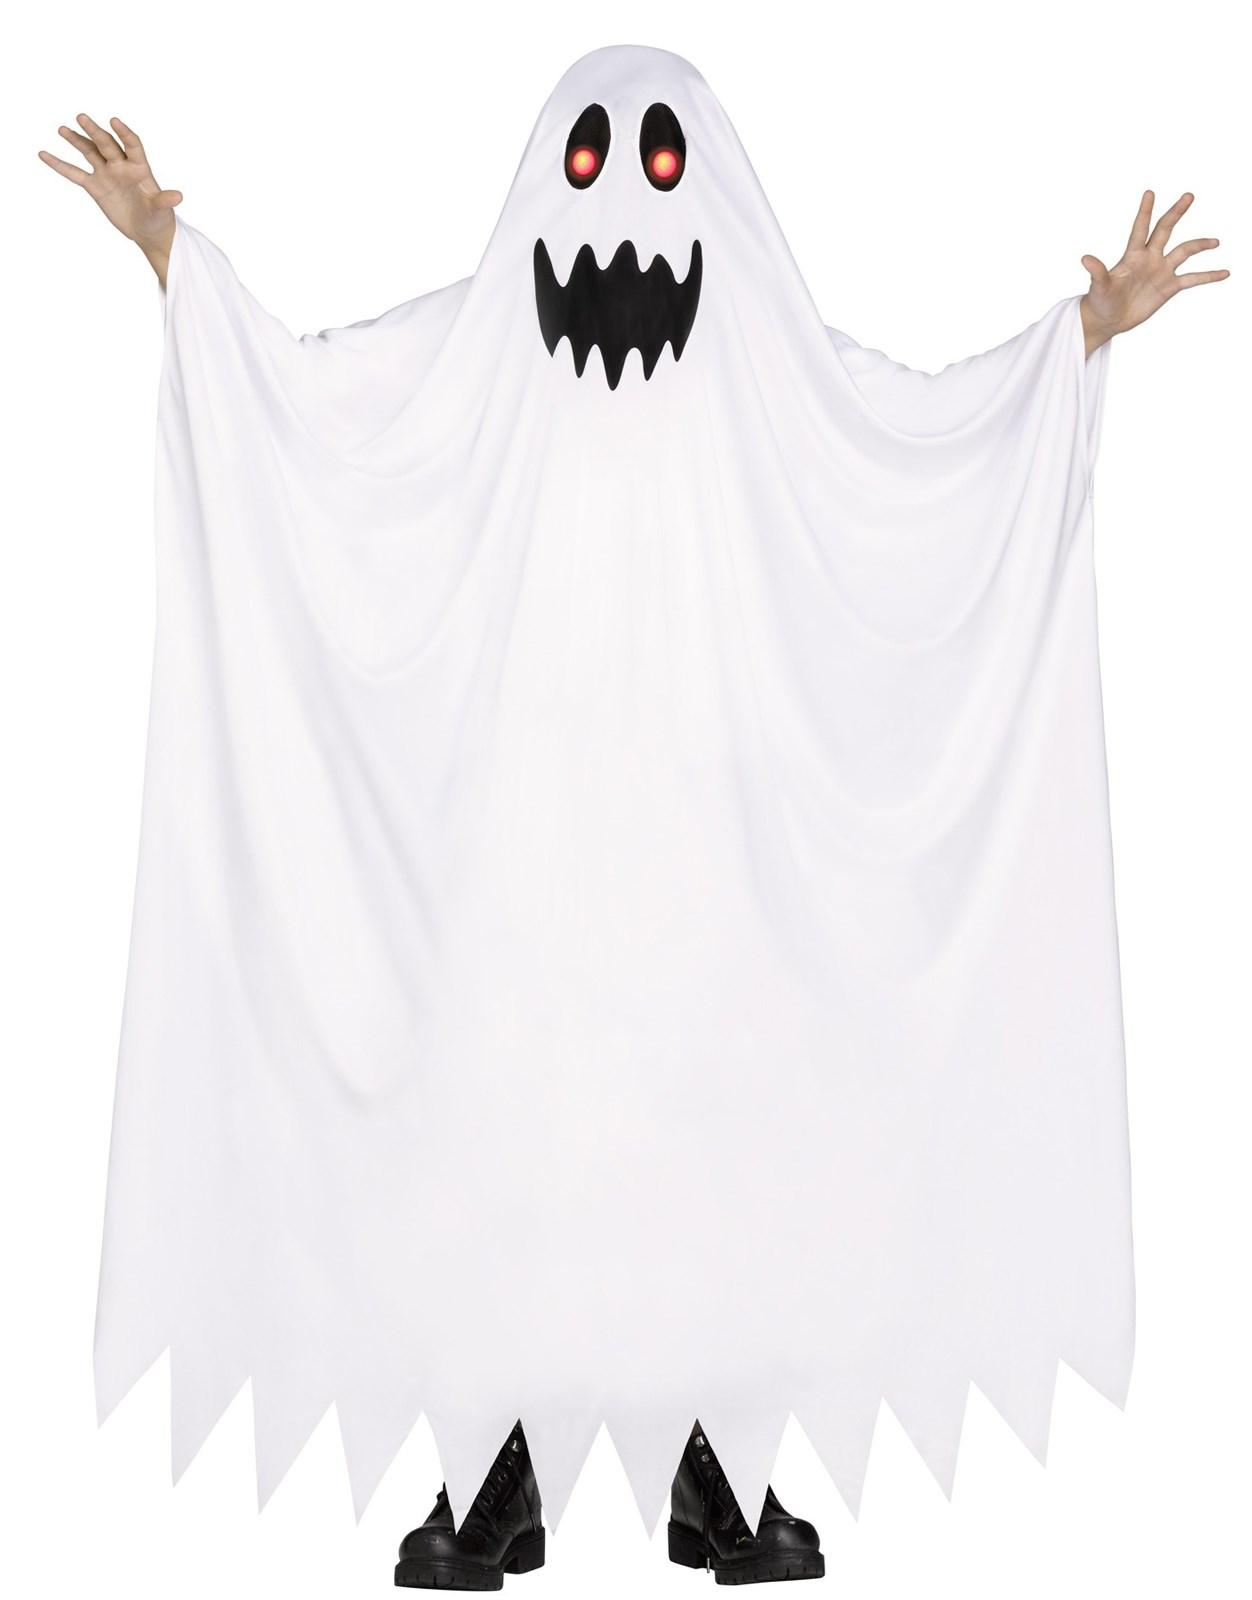 Devil, Demon, & Ghost Costumes | BuyCostumes.com